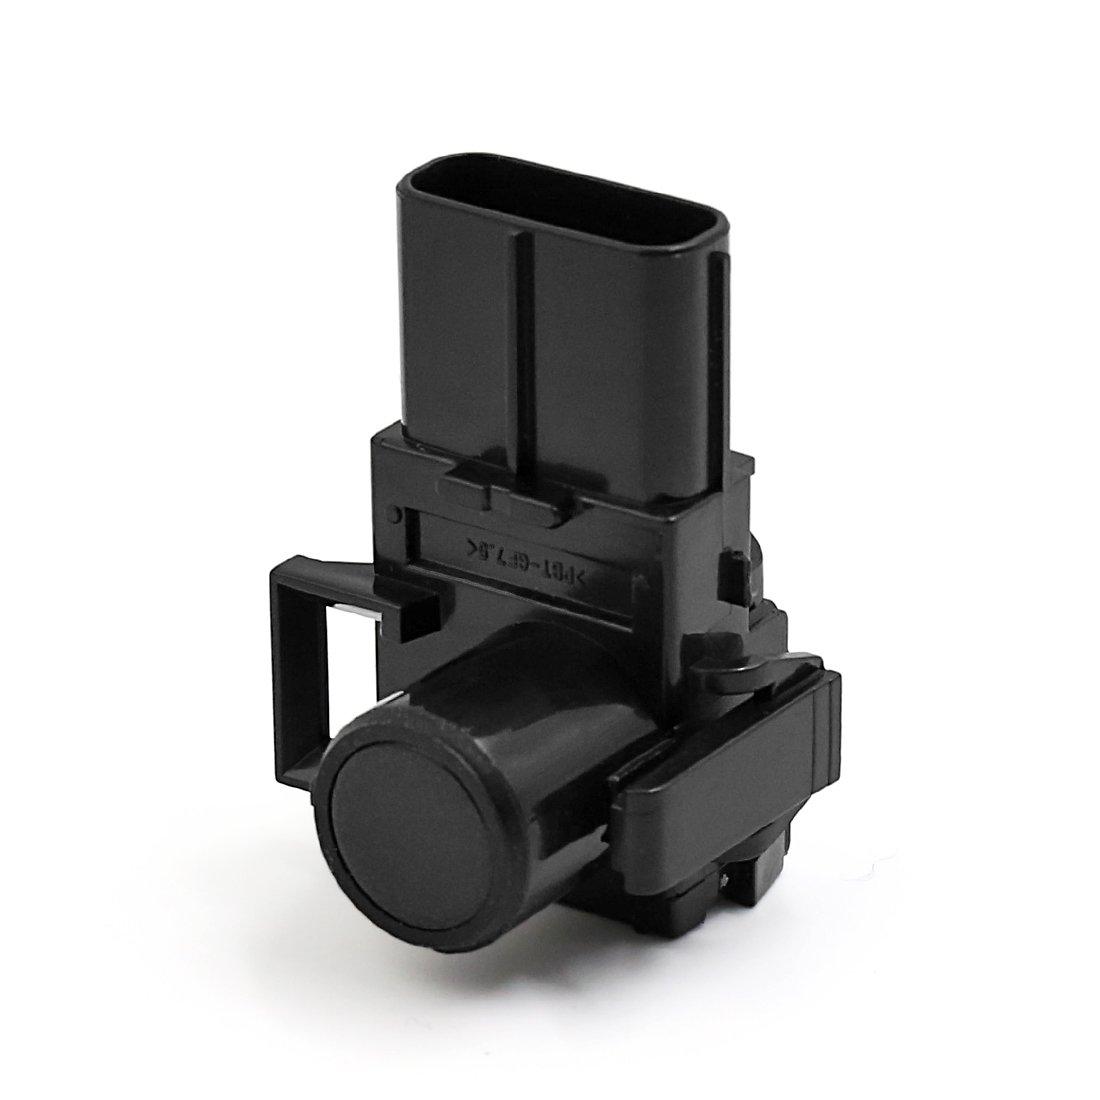 uxcell a17041000ux0052 Parking Aid Sensor